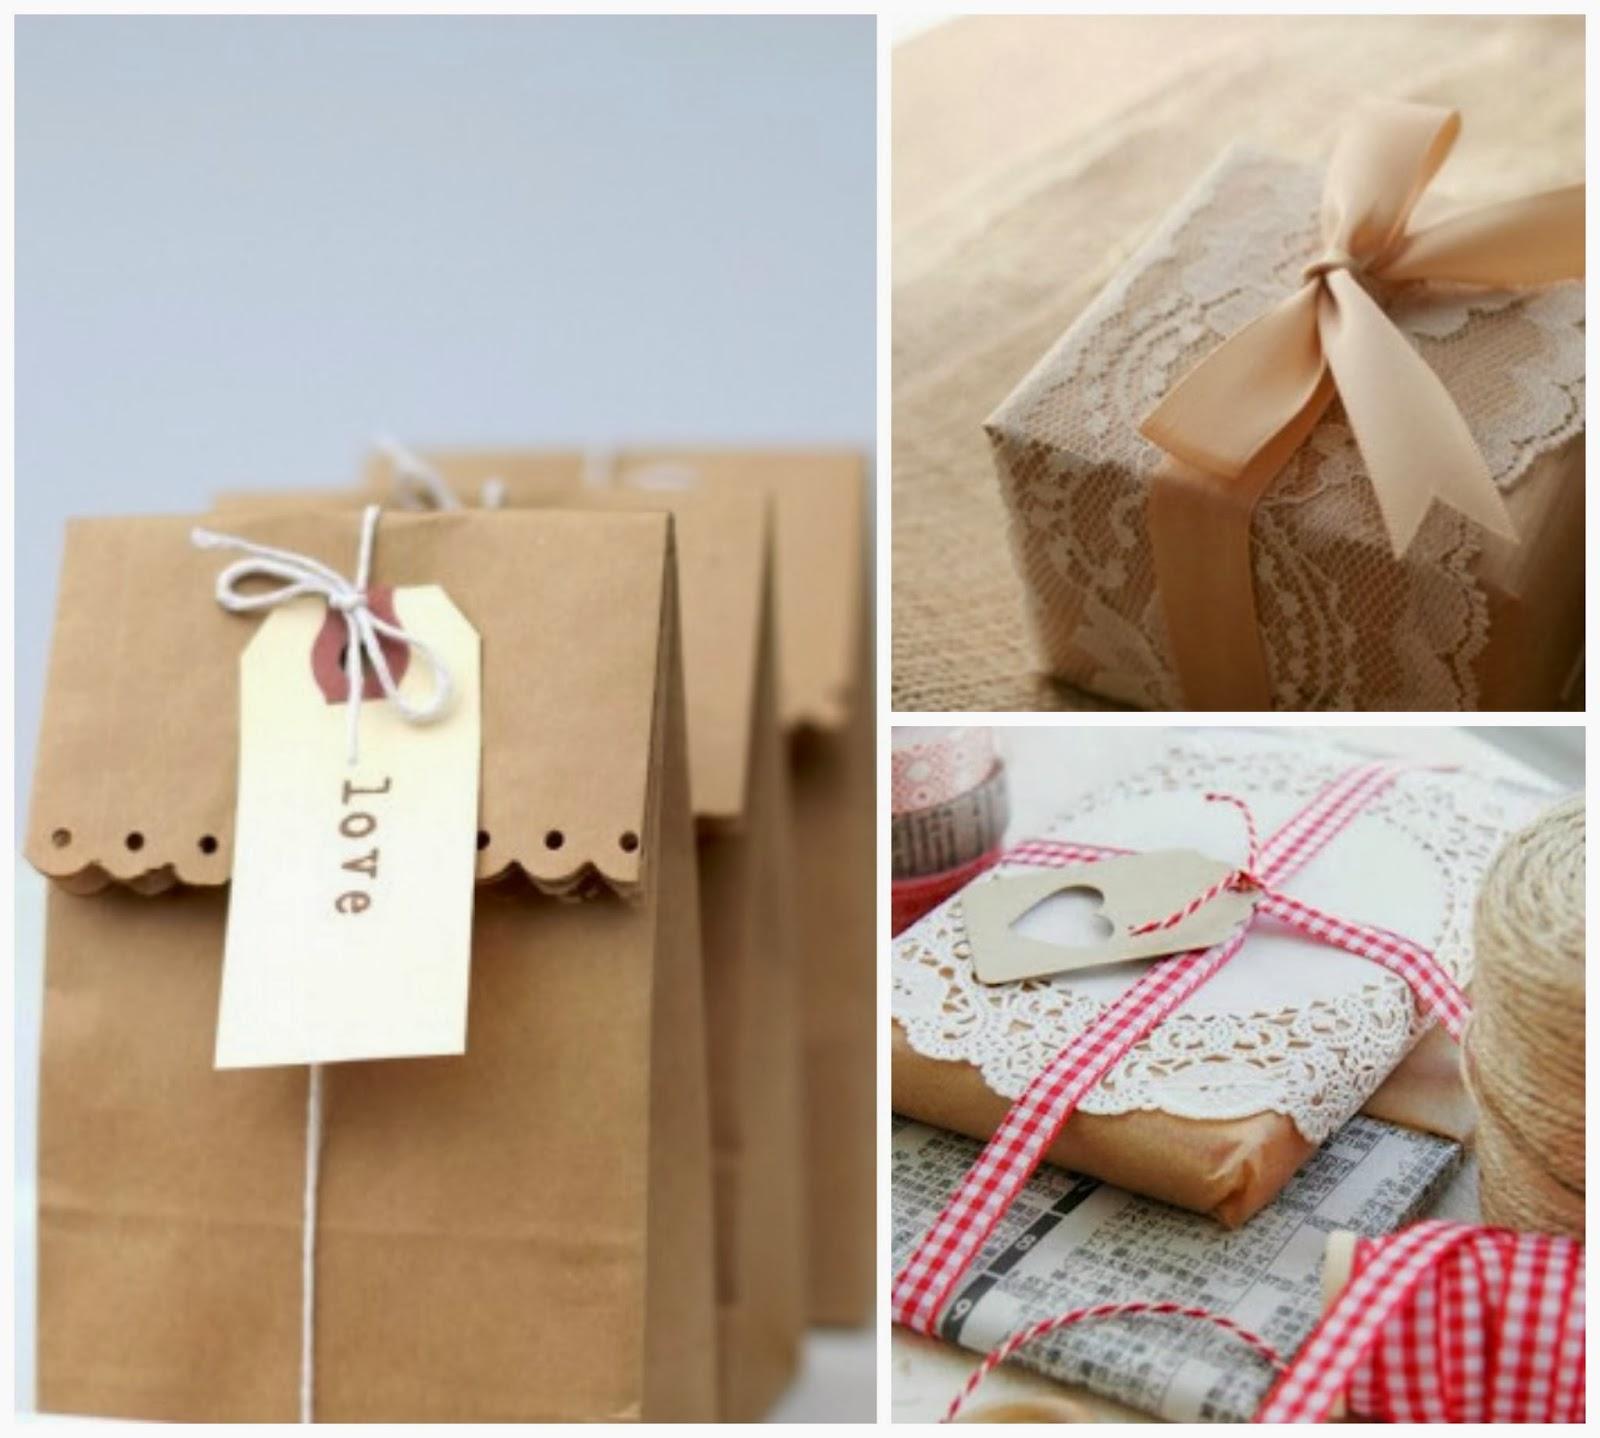 natal-presente-embalagem-papel-craft-tag-renda-barbante-bakers-twine